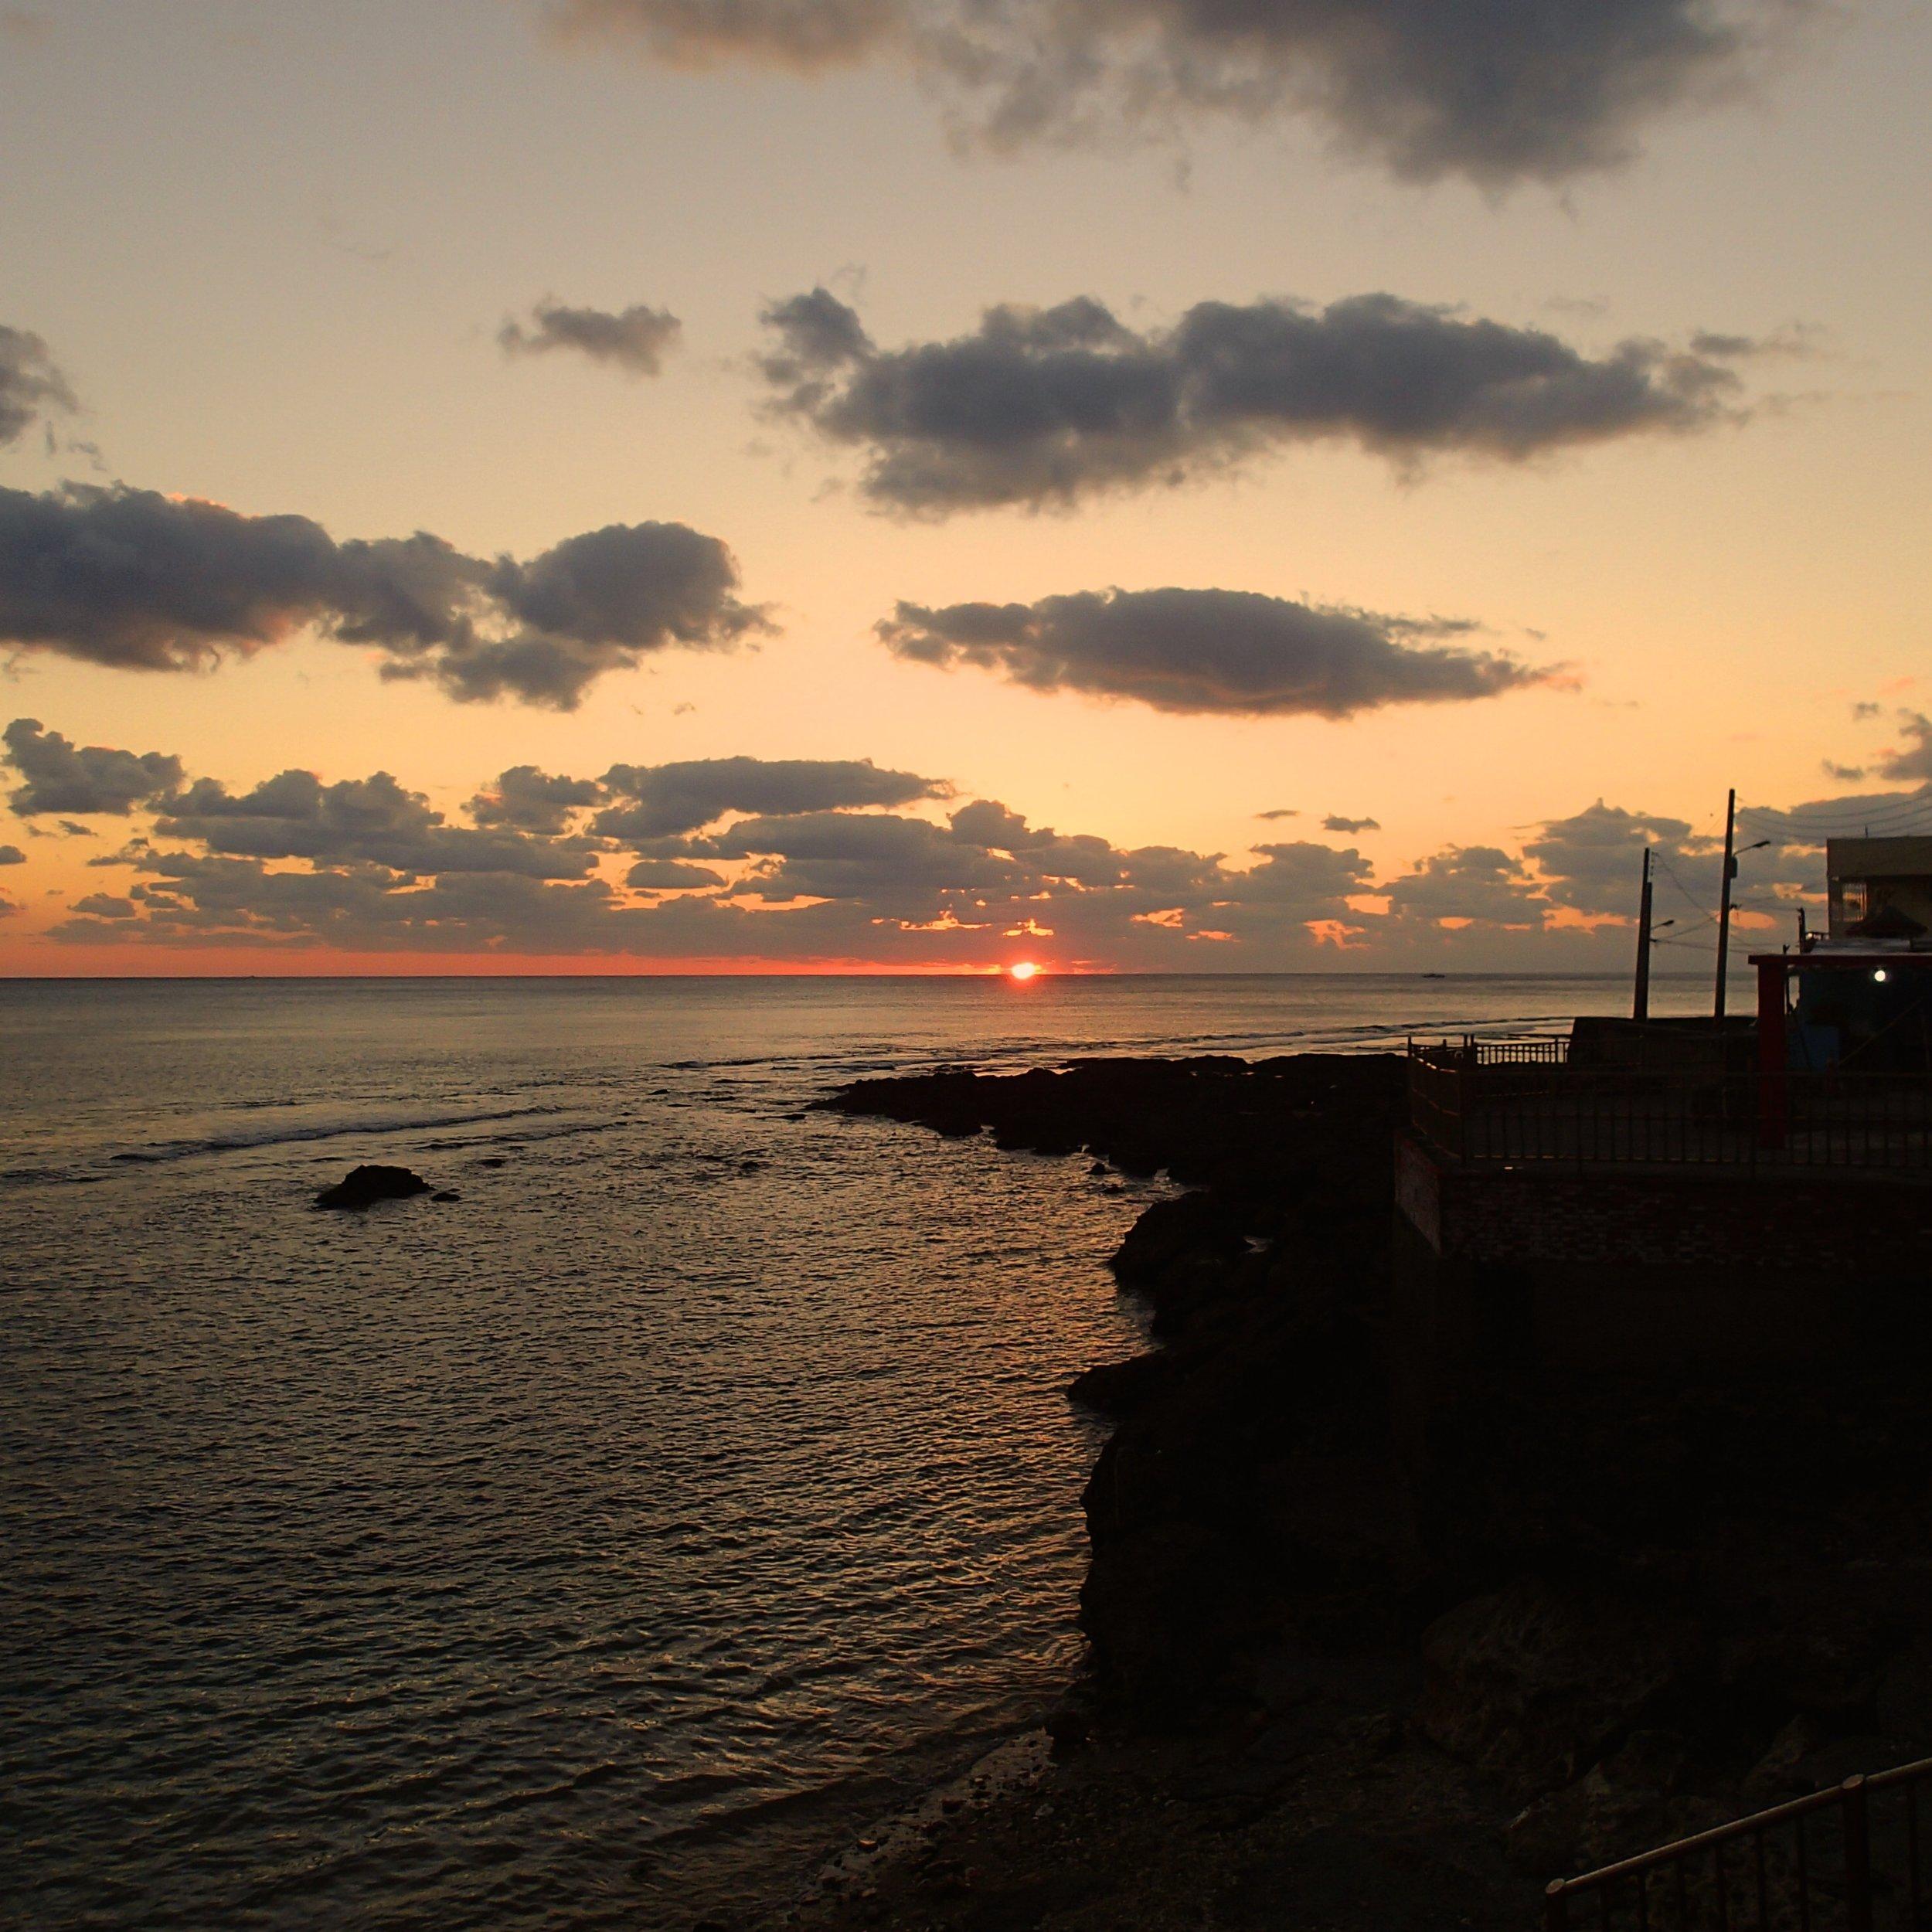 sunset bike ride (1).jpg